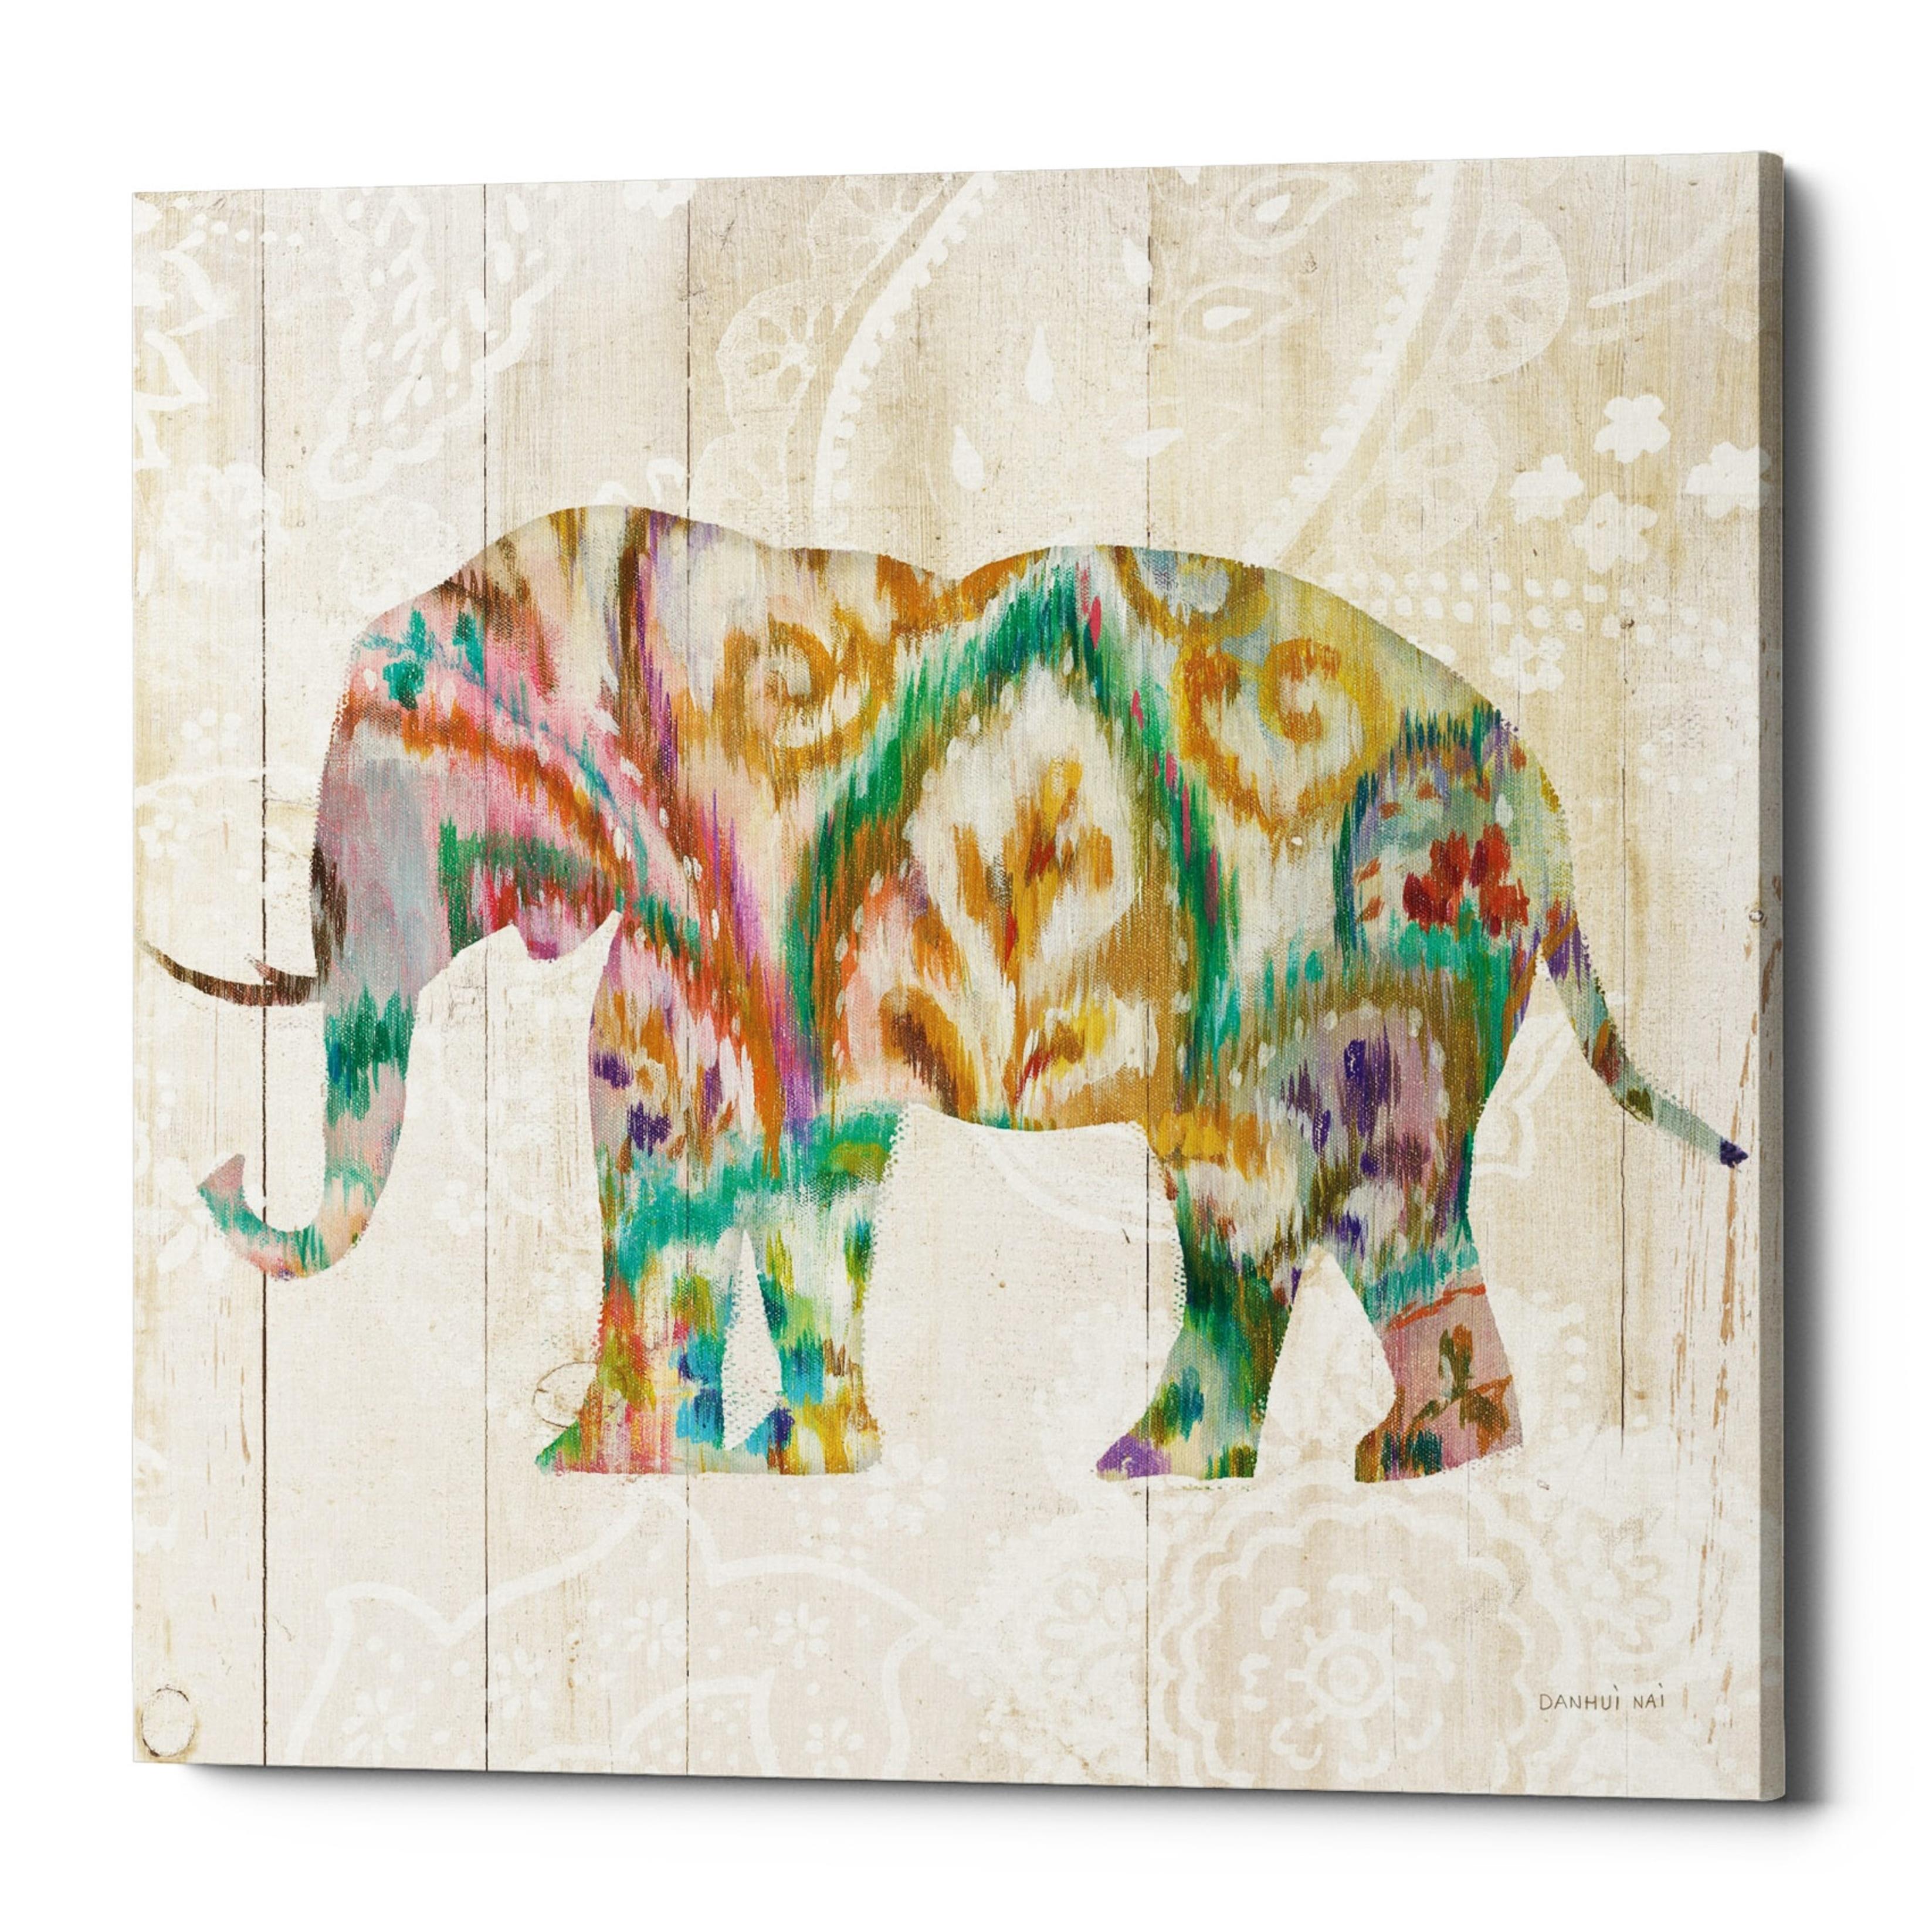 Epic Graffiti Boho Paisley Elephant Ii V2 By Danhui Nai Giclee Canvas Wall Art 18 X 18 Overstock 23177021